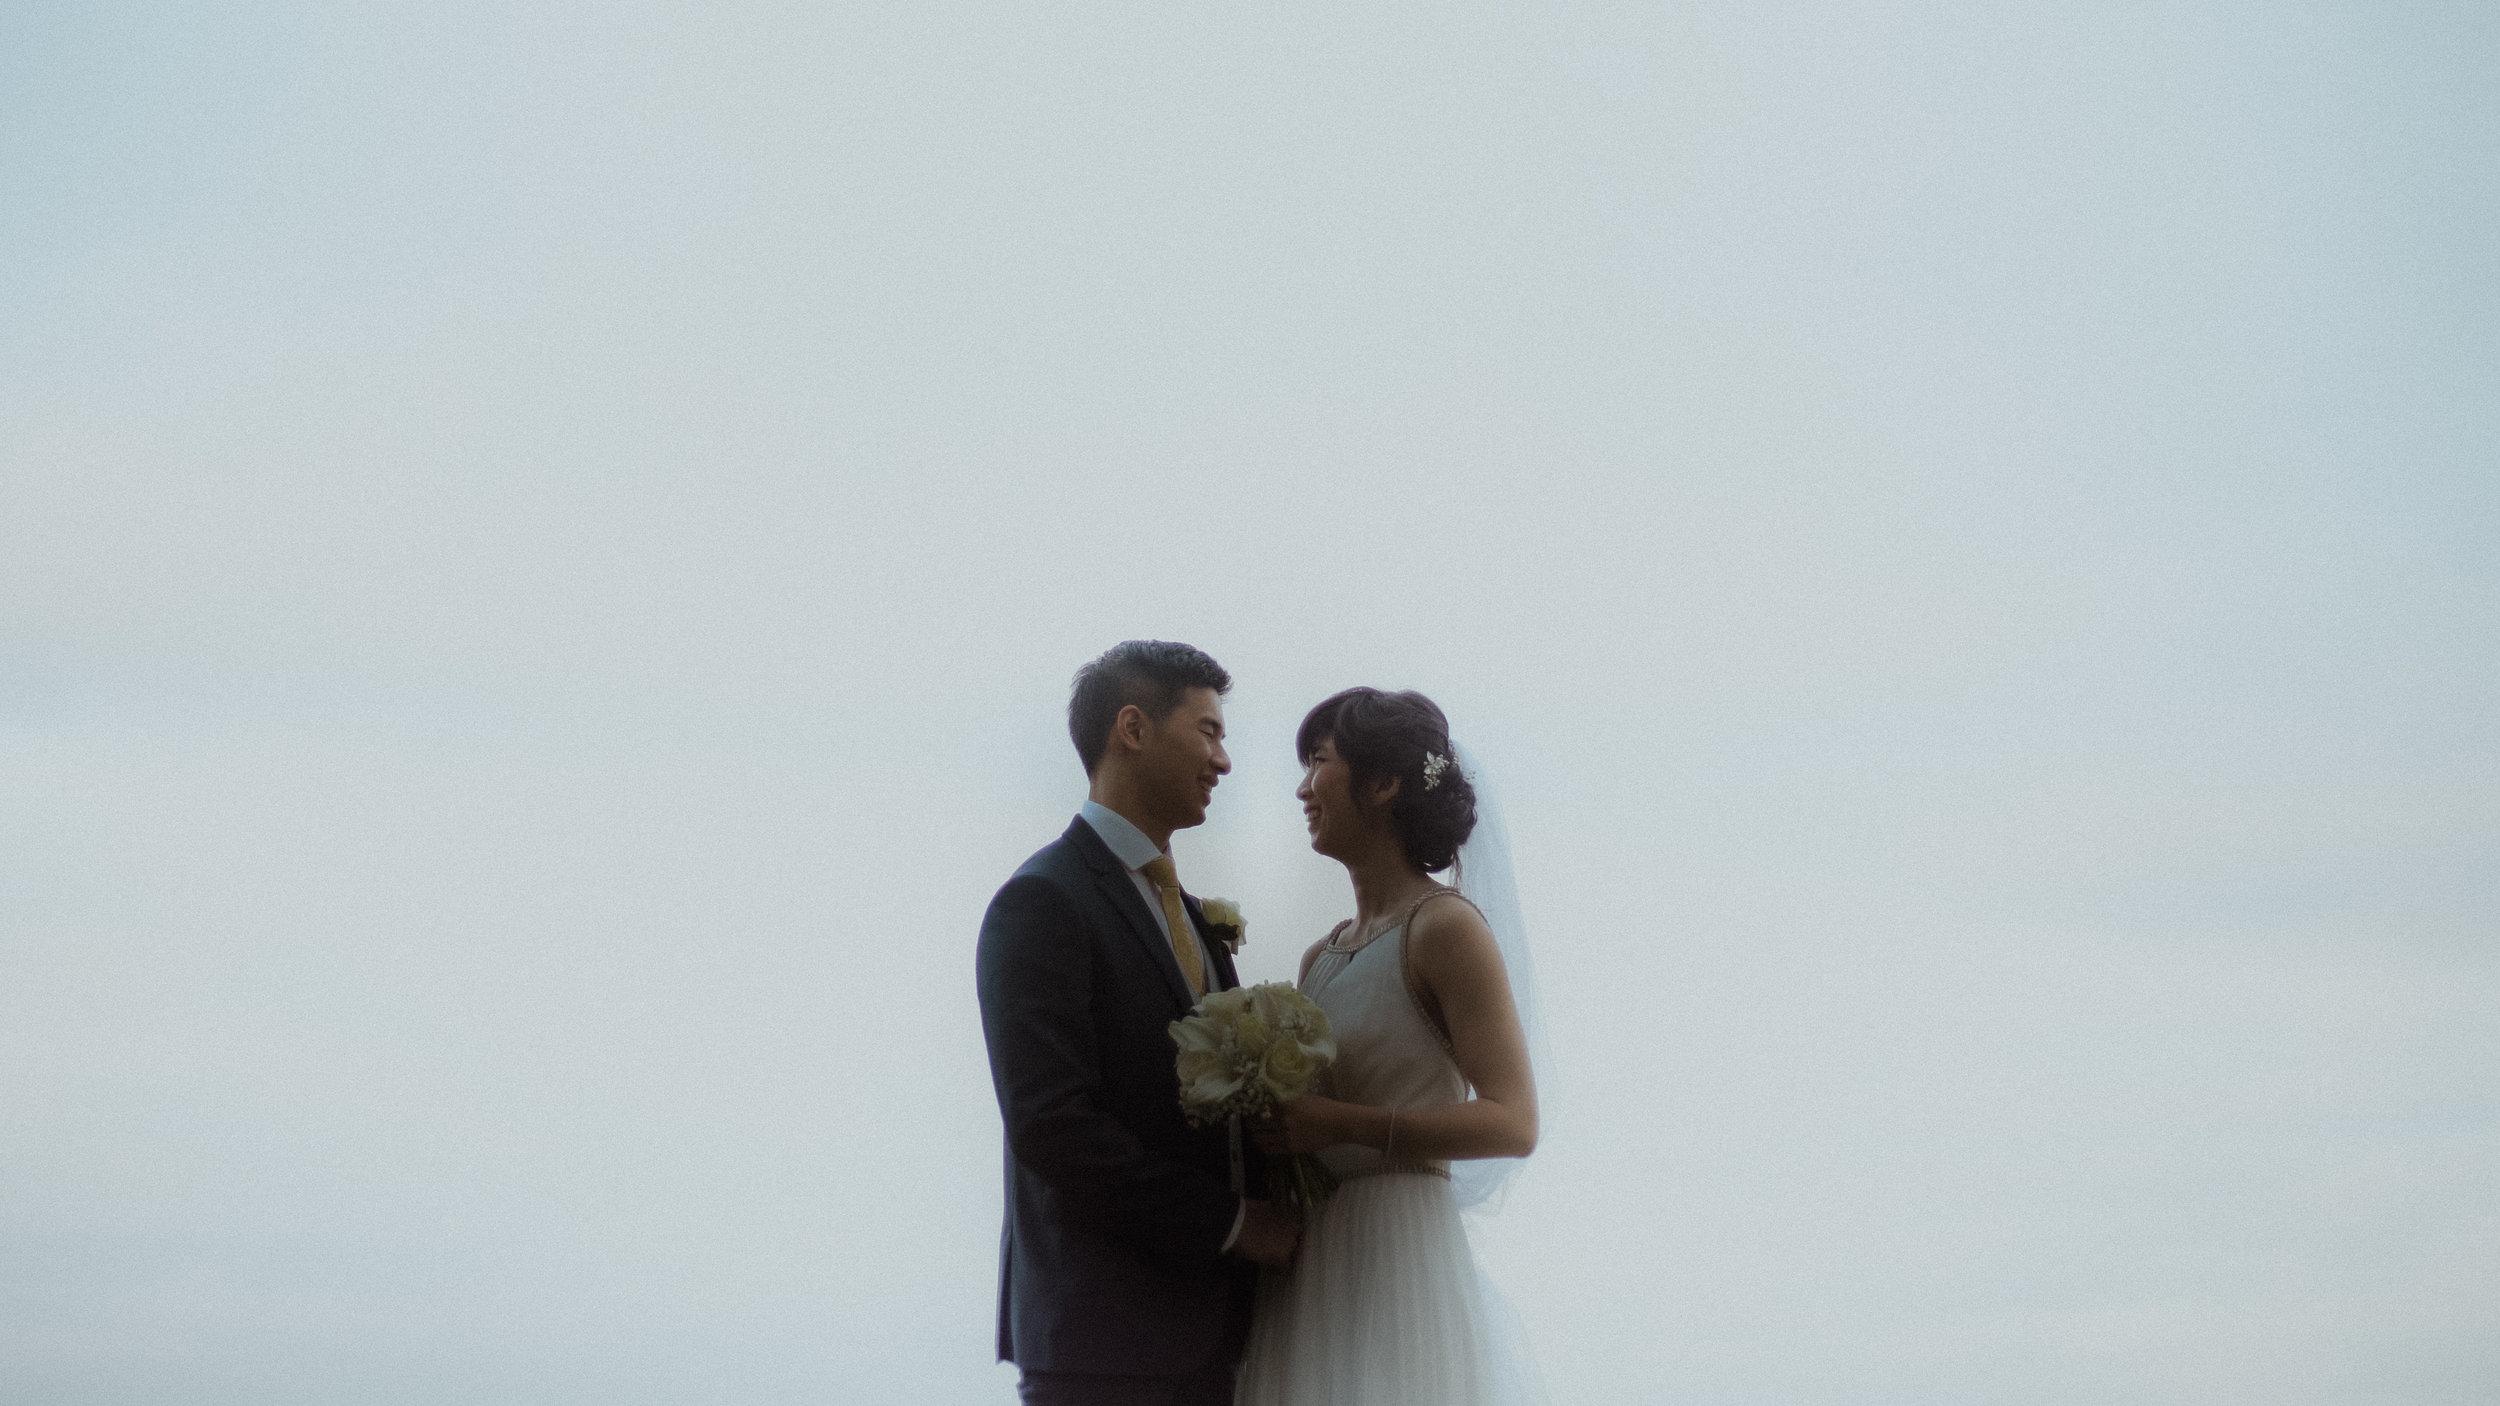 LiLi_Tim_Wedding_Film-03.jpg